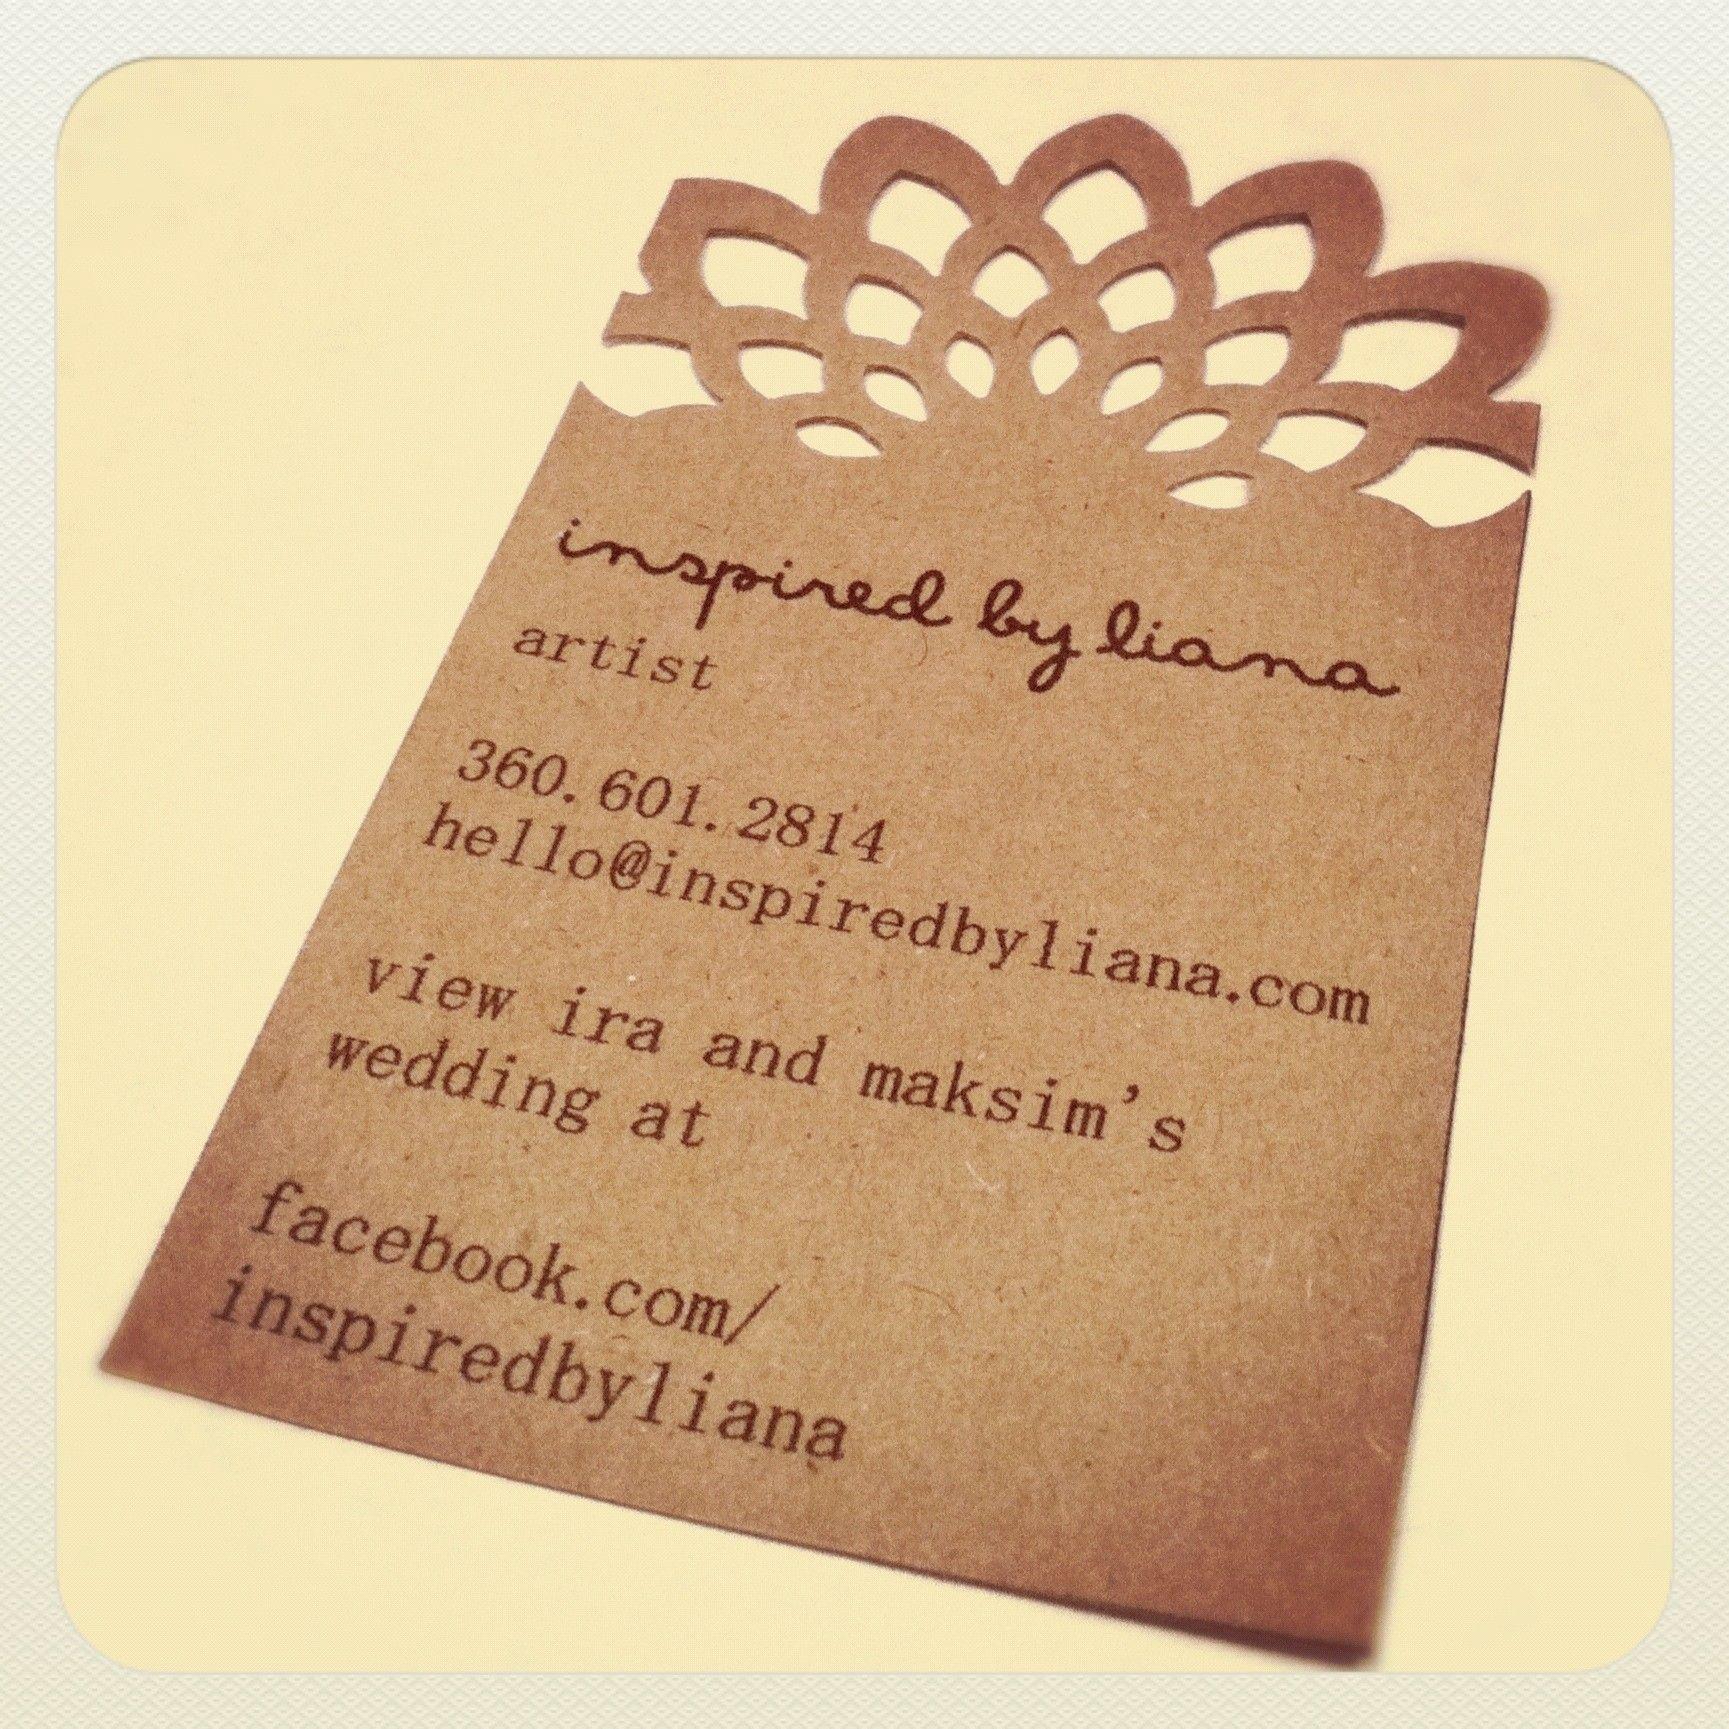 homemade business cards!   Business Cards   Pinterest   Business ...